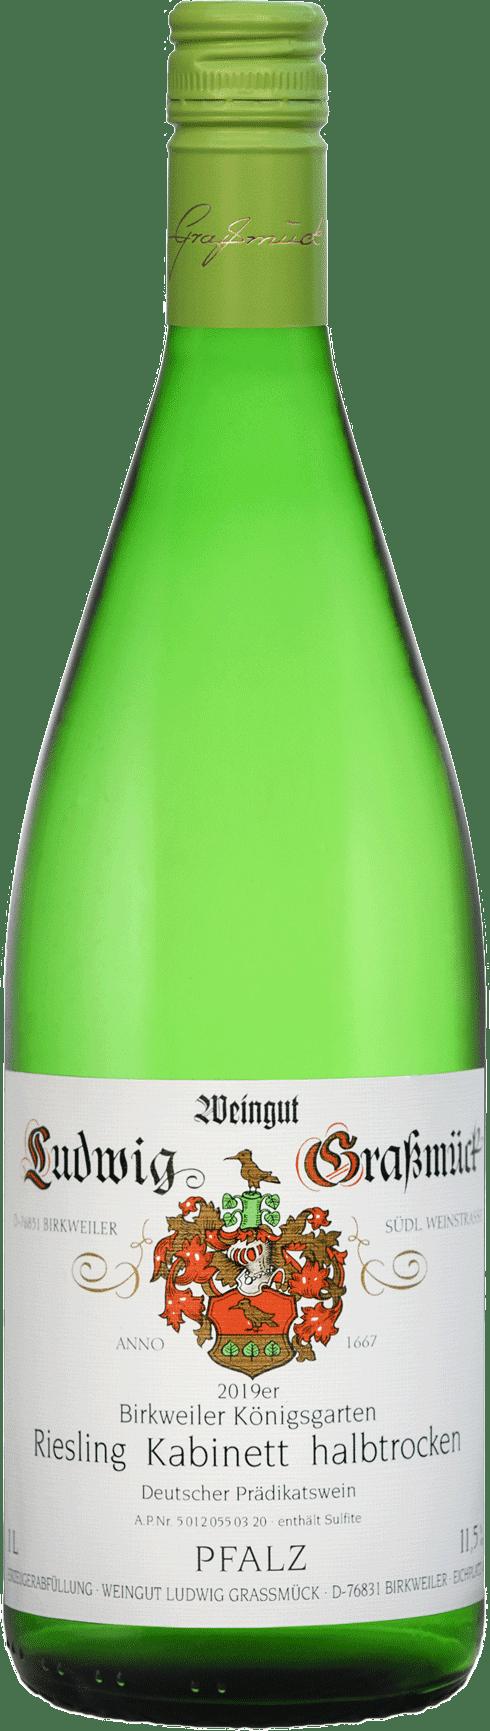 Weingut Ludwig Graßmück, Simon Graßmück, Riesling Kabinett, halbtrocken 2019